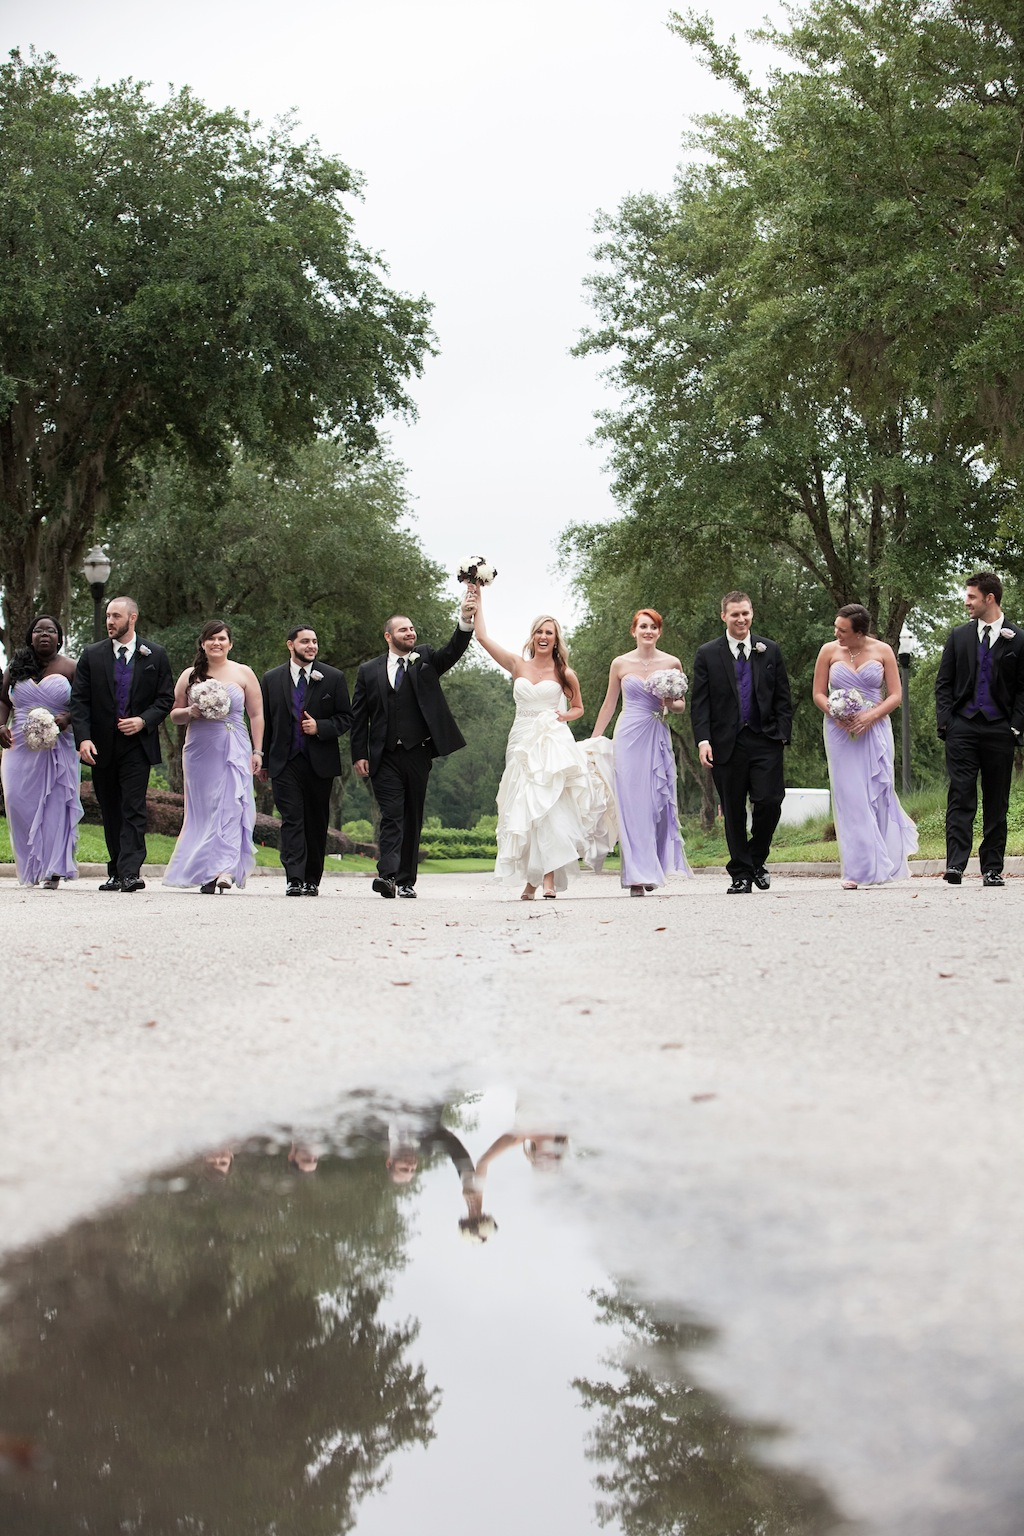 Brooksville Wedding - Purple, Silver & Ivory Wedding at Southern Hills Plantation Club - Brooksville Wedding Photographer Blue Lane Studios (39)